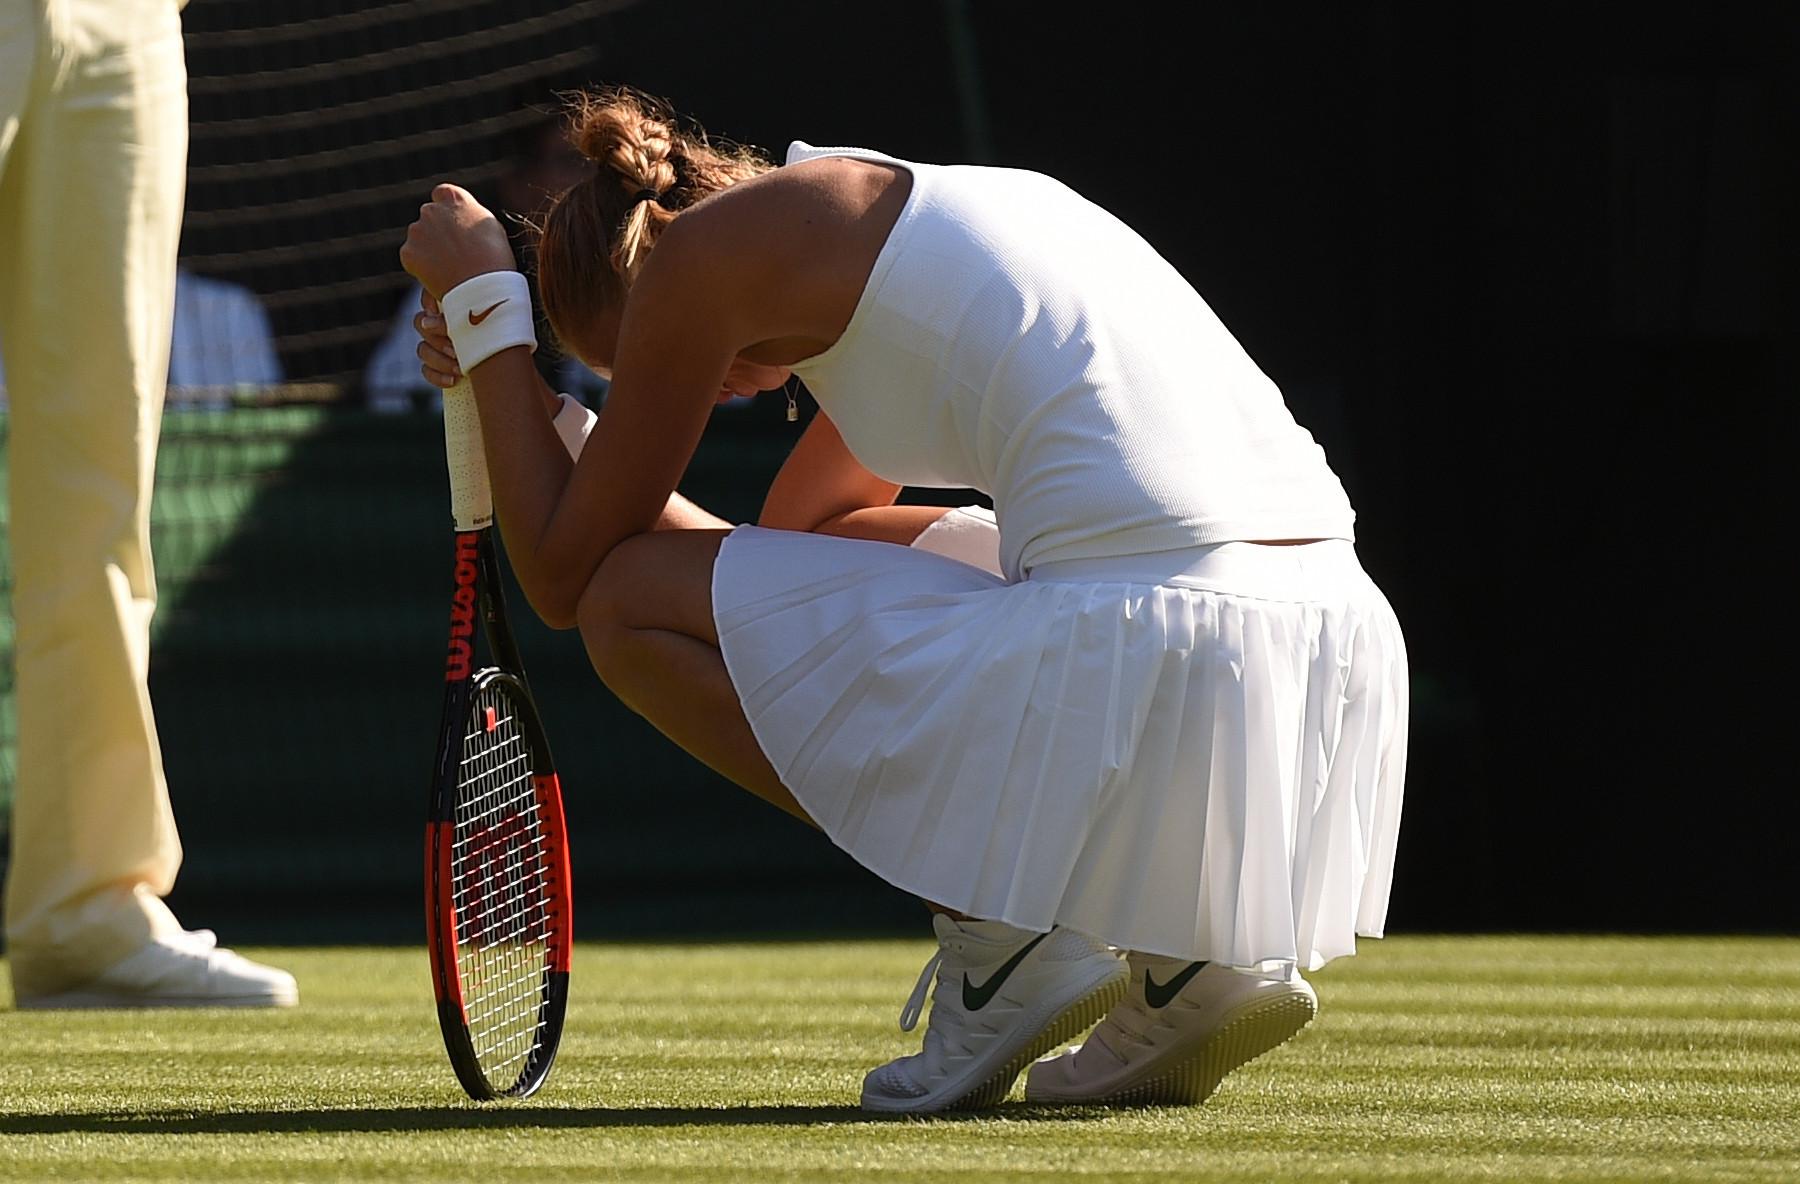 Two-time Wimbledon champion Kvitova falls to first round defeat